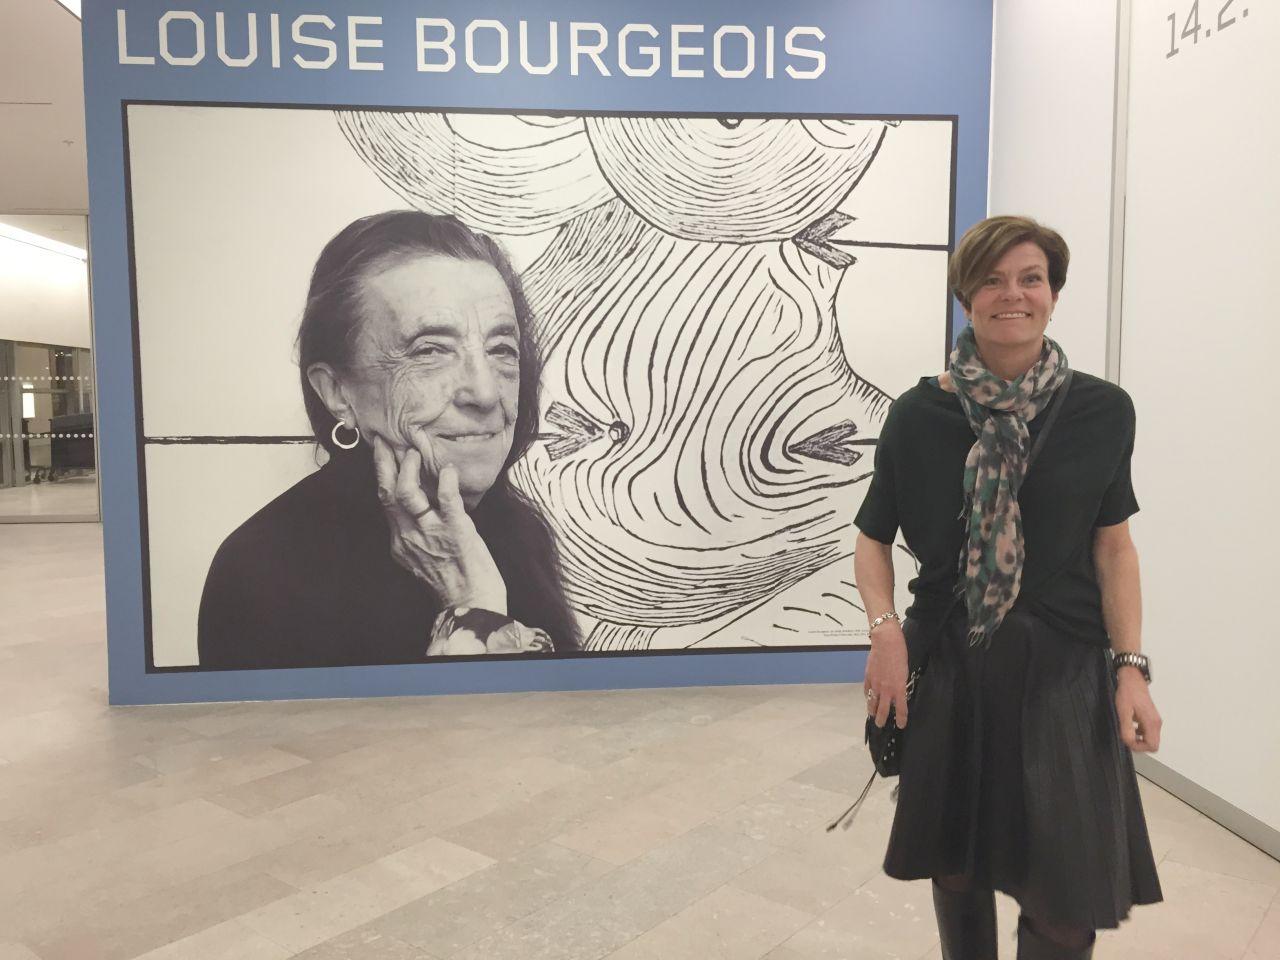 Louise Bourgeois Maman #whydontyou